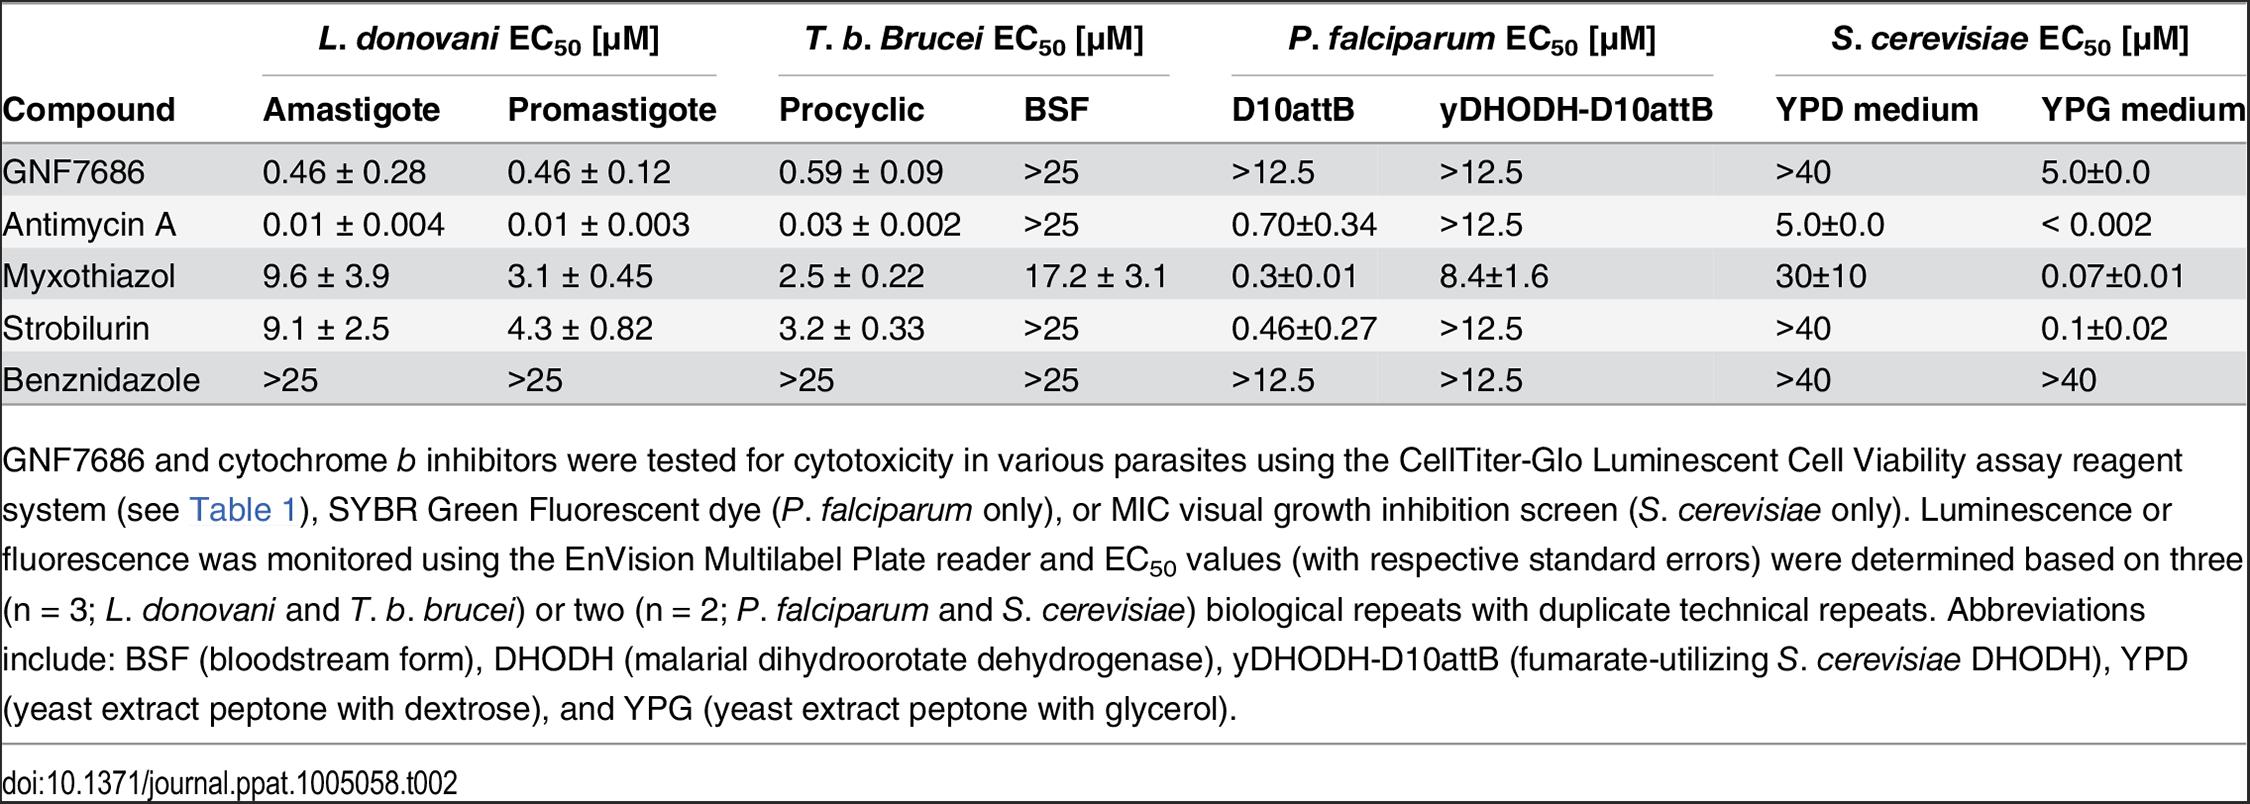 Potency of GNF7686 and prototypic cytochrome <i>b</i> inhibitors in <i>L</i>. <i>donovani</i>, <i>T</i>. <i>brucei</i>, <i>P</i>. <i>falciparum</i> and <i>S</i>. <i>cerevisiae</i> proliferation assays.